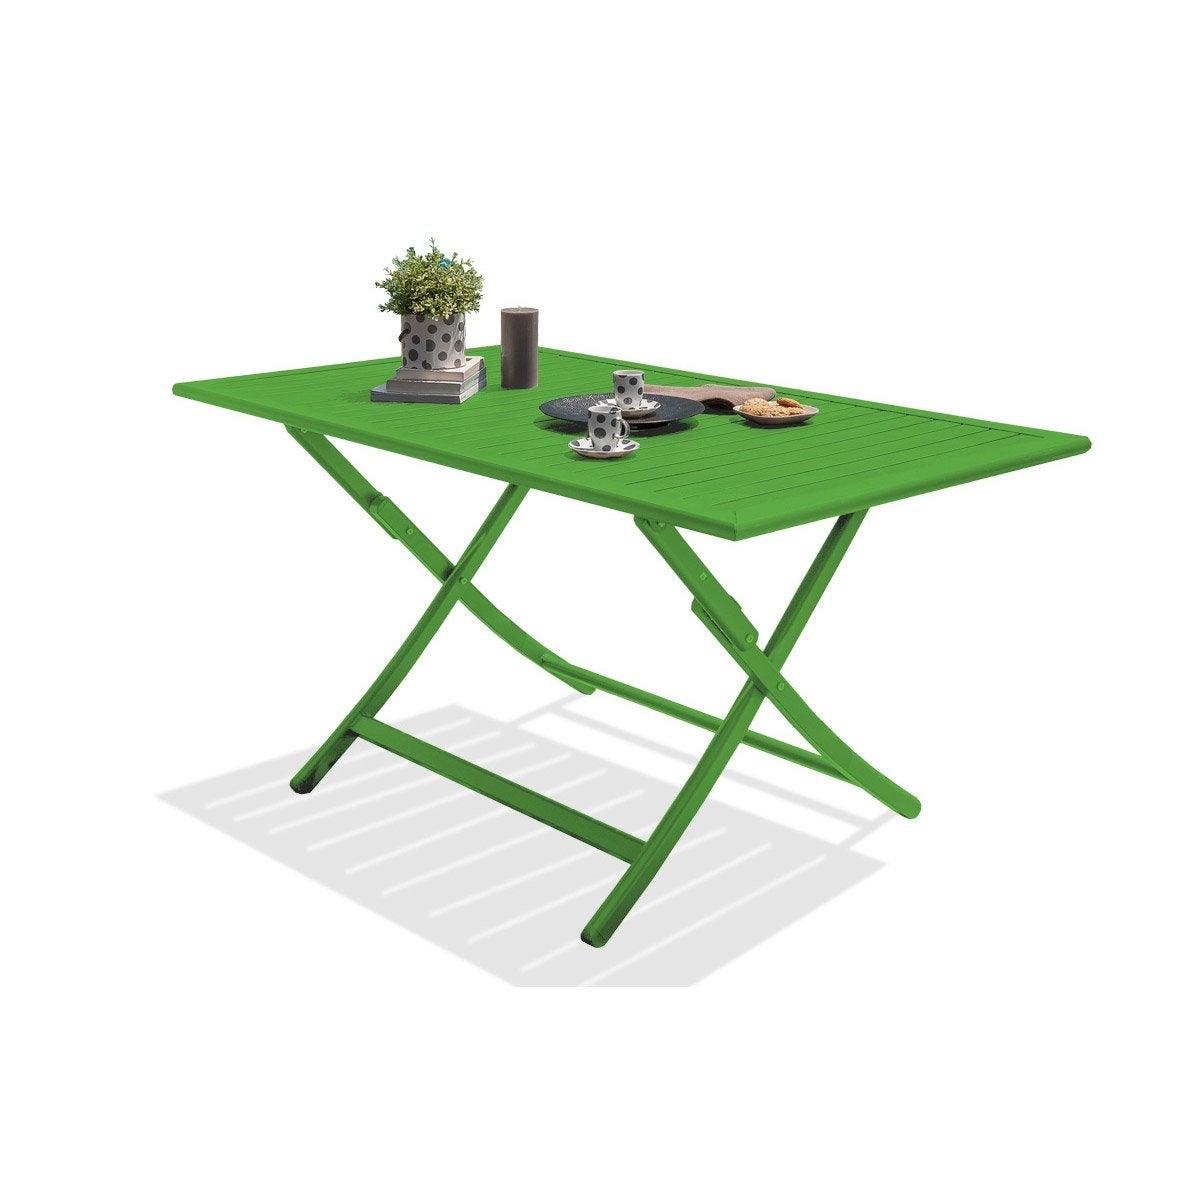 Table Meilleur PrixLeroy AluminiumBoisRésine Jardin Merlin Au De WEH9YDI2